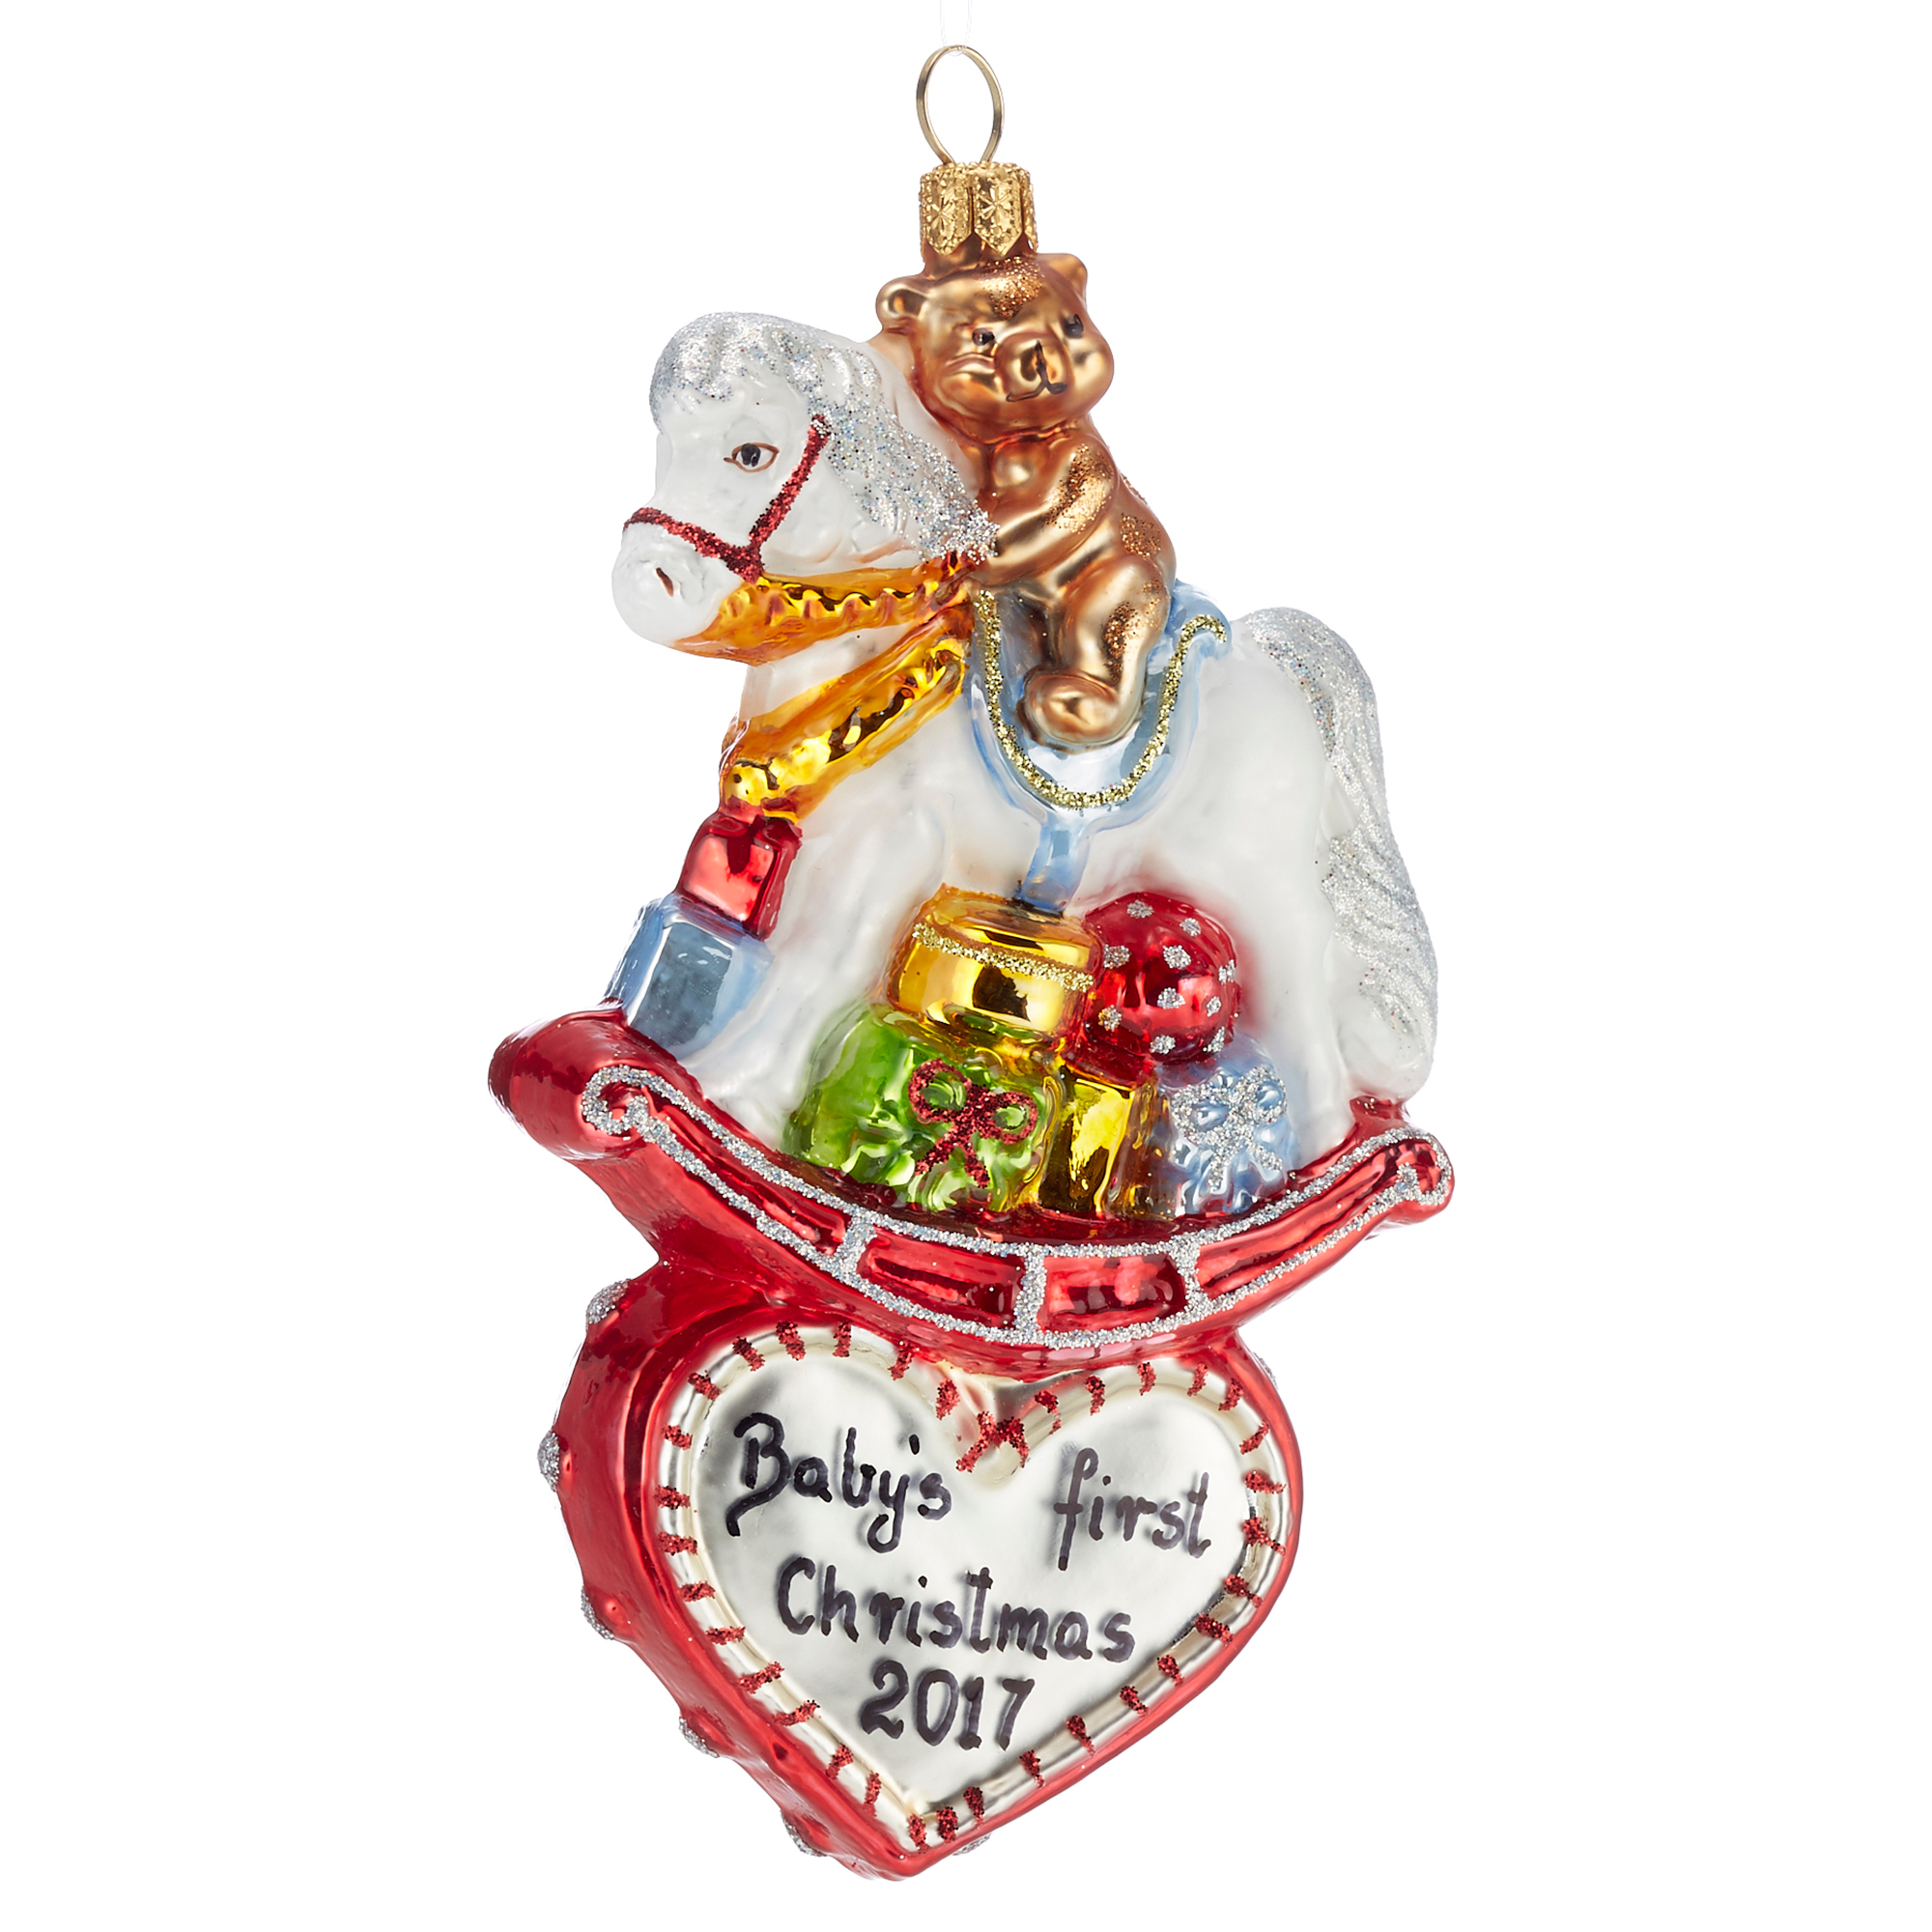 2017 Rocking Horse Christmas Ornament | Gump\'s